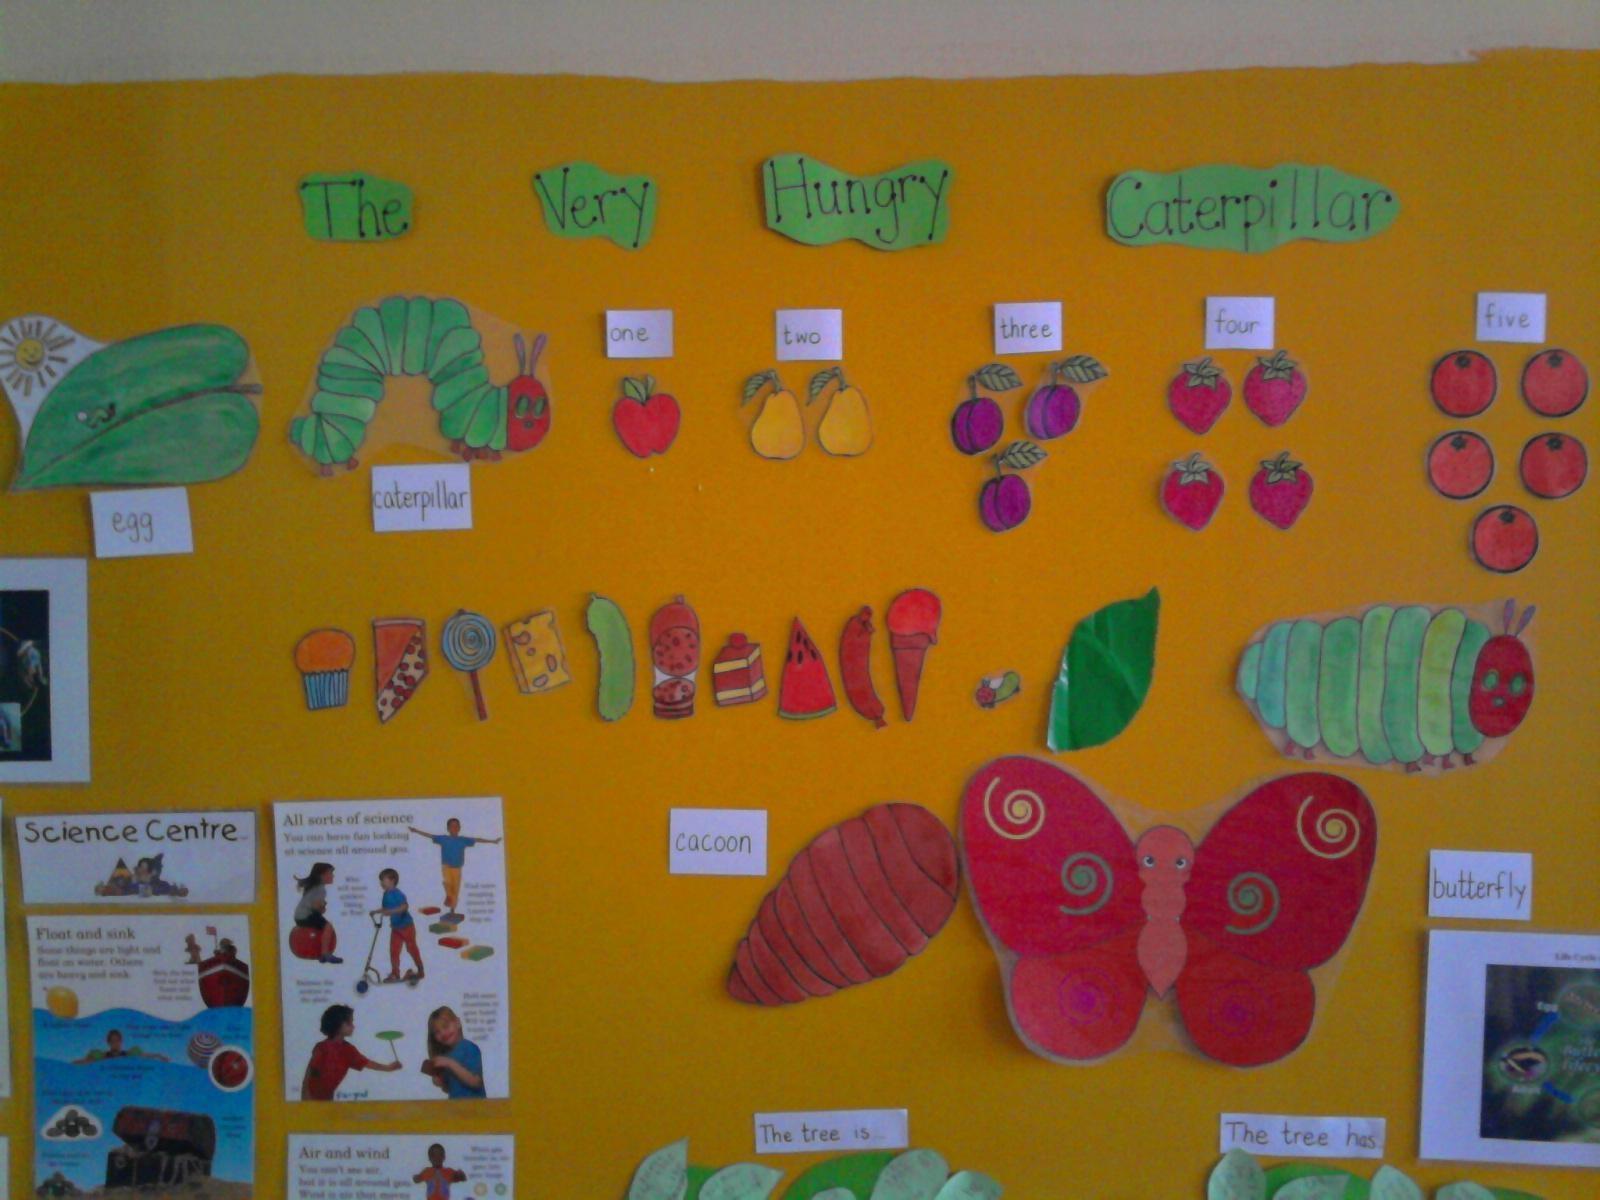 Kindergarten Themes   What A Teacher pertaining to Very Hungry Caterpillar Wall Art